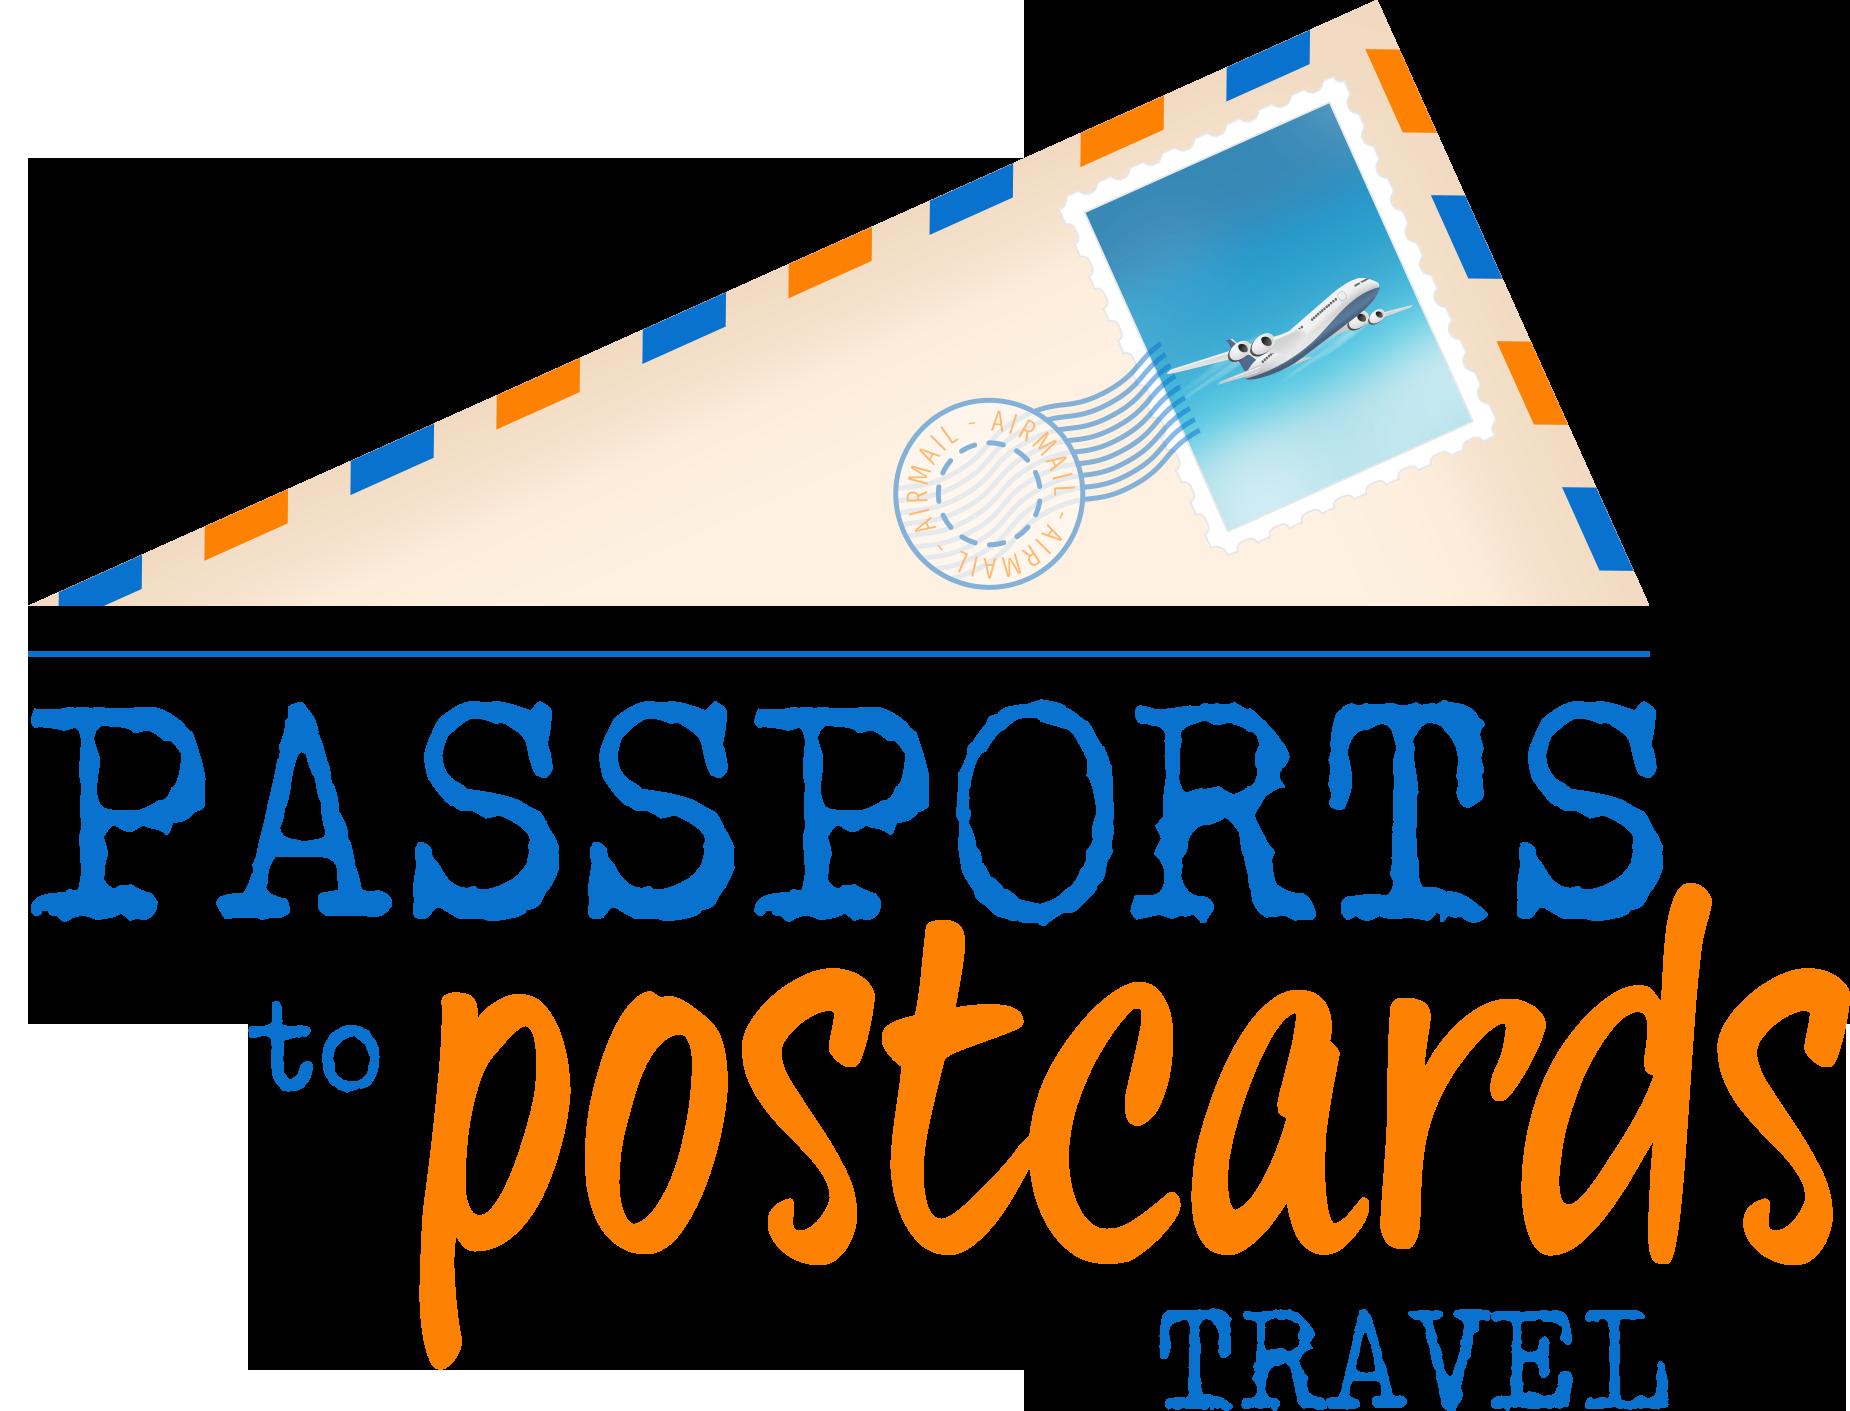 Passports to Postcards Travel